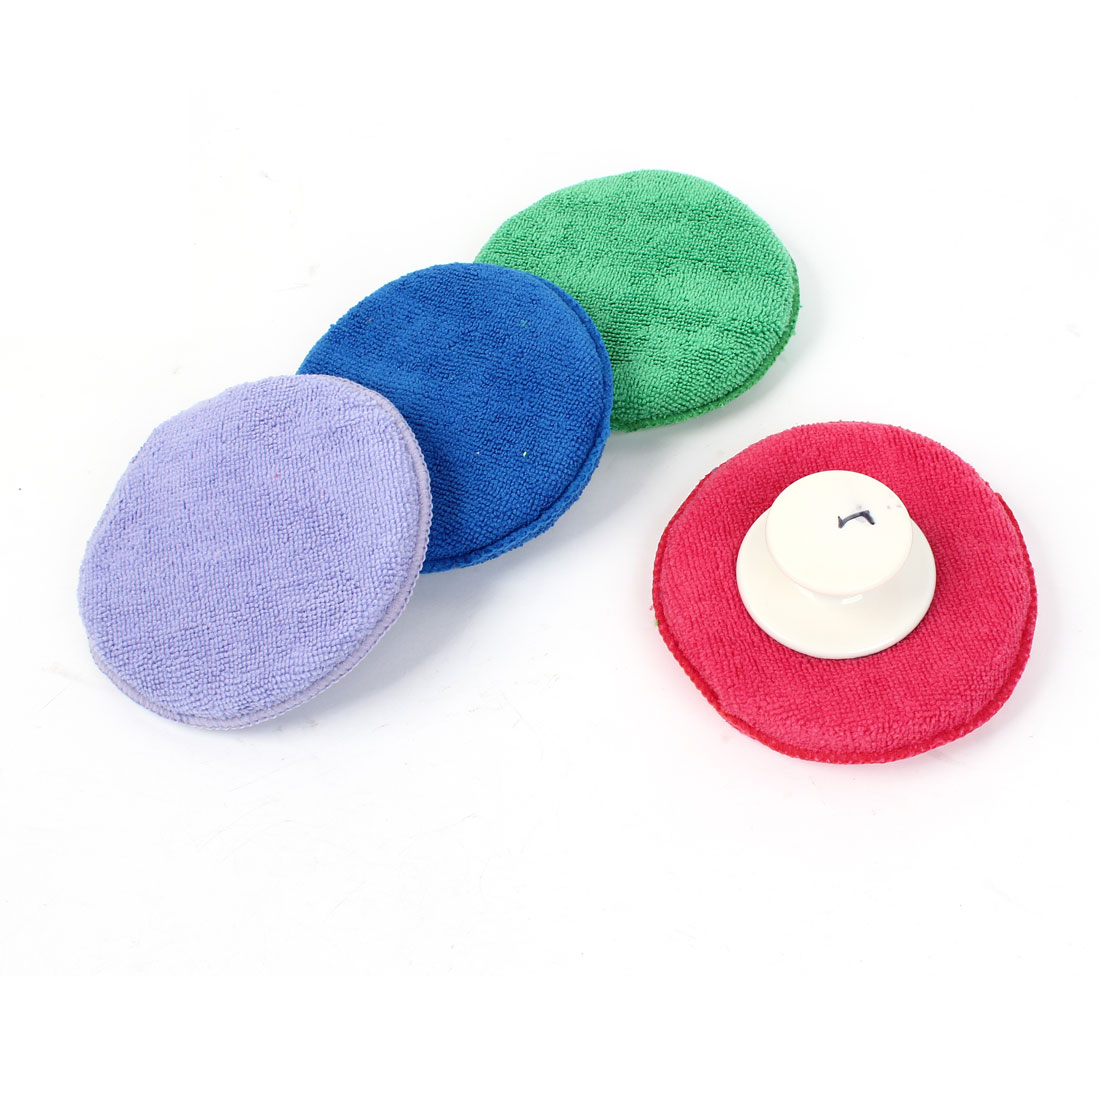 4 Pcs Round Sponge Washing Waxing Polishing Wheel Pads 13cm Dia for Auto